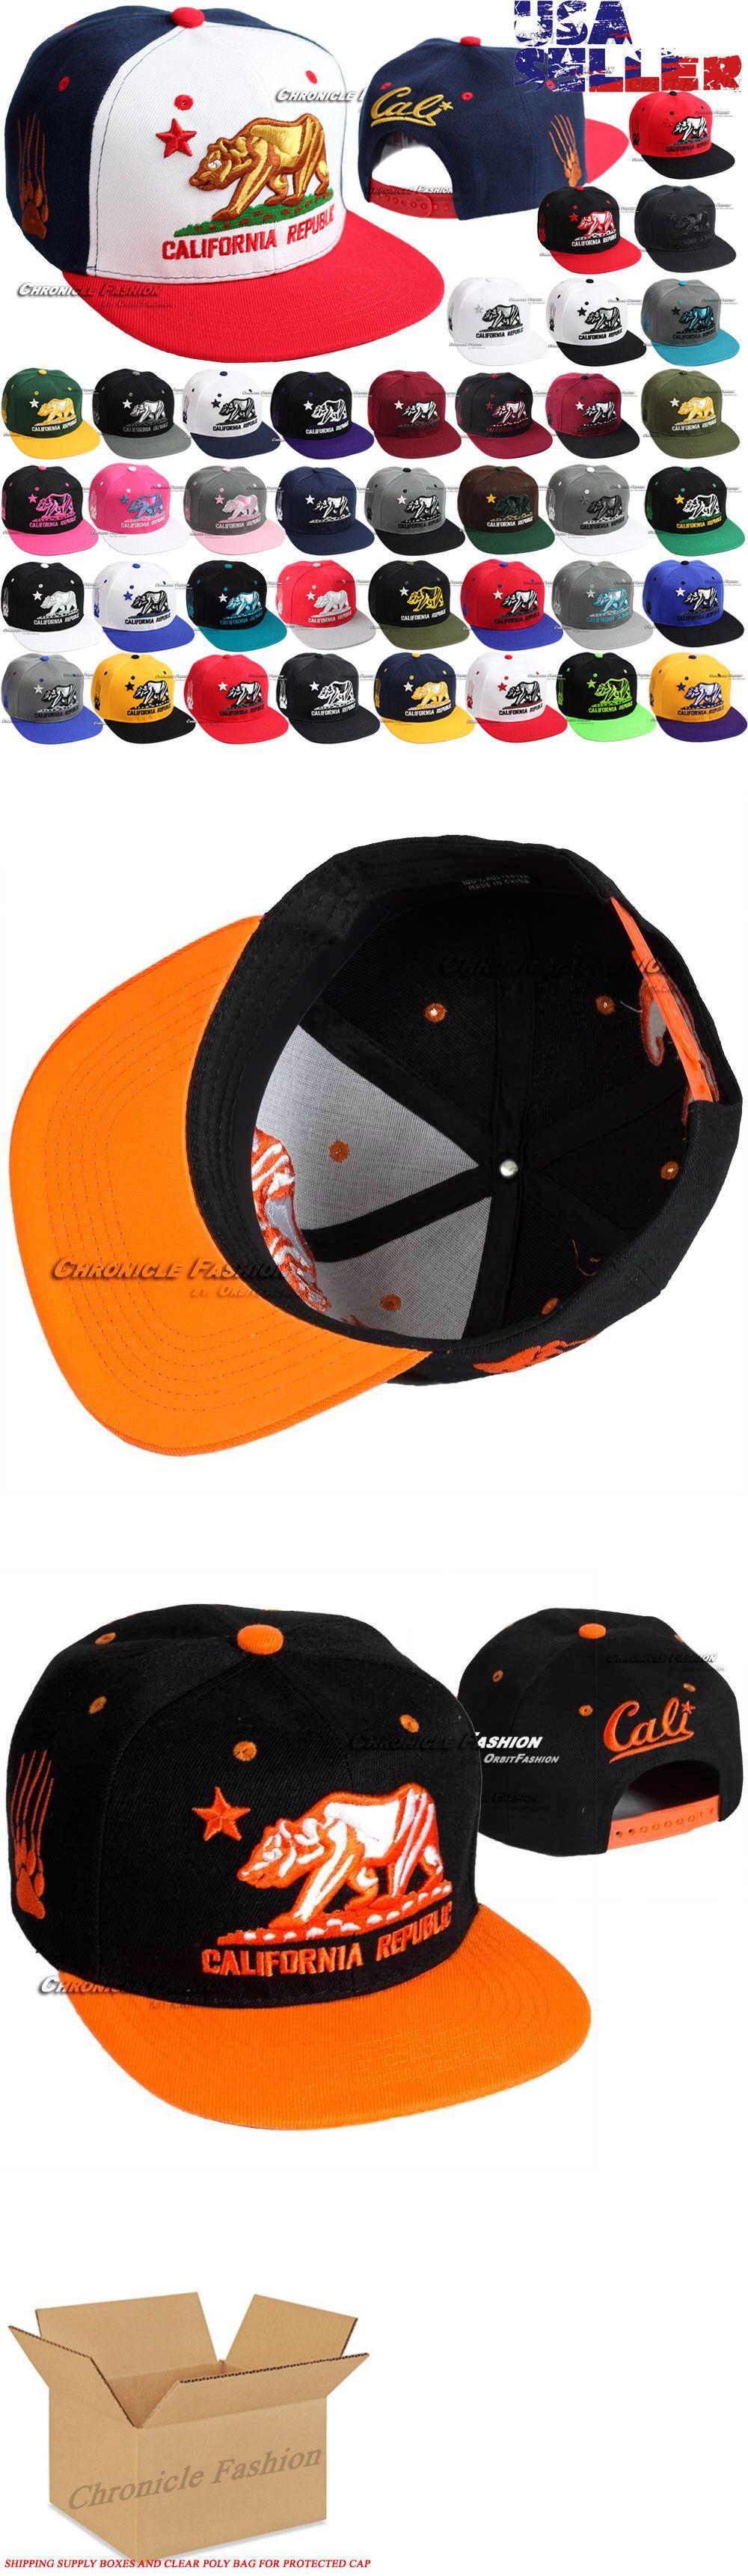 Hats 52365  Cali Baseball Cap California Republic Bear Embroidered Snapback  Hats Flat Men -  BUY IT NOW ONLY   11.35 on  eBay  baseball  california ... 724c168e1cba